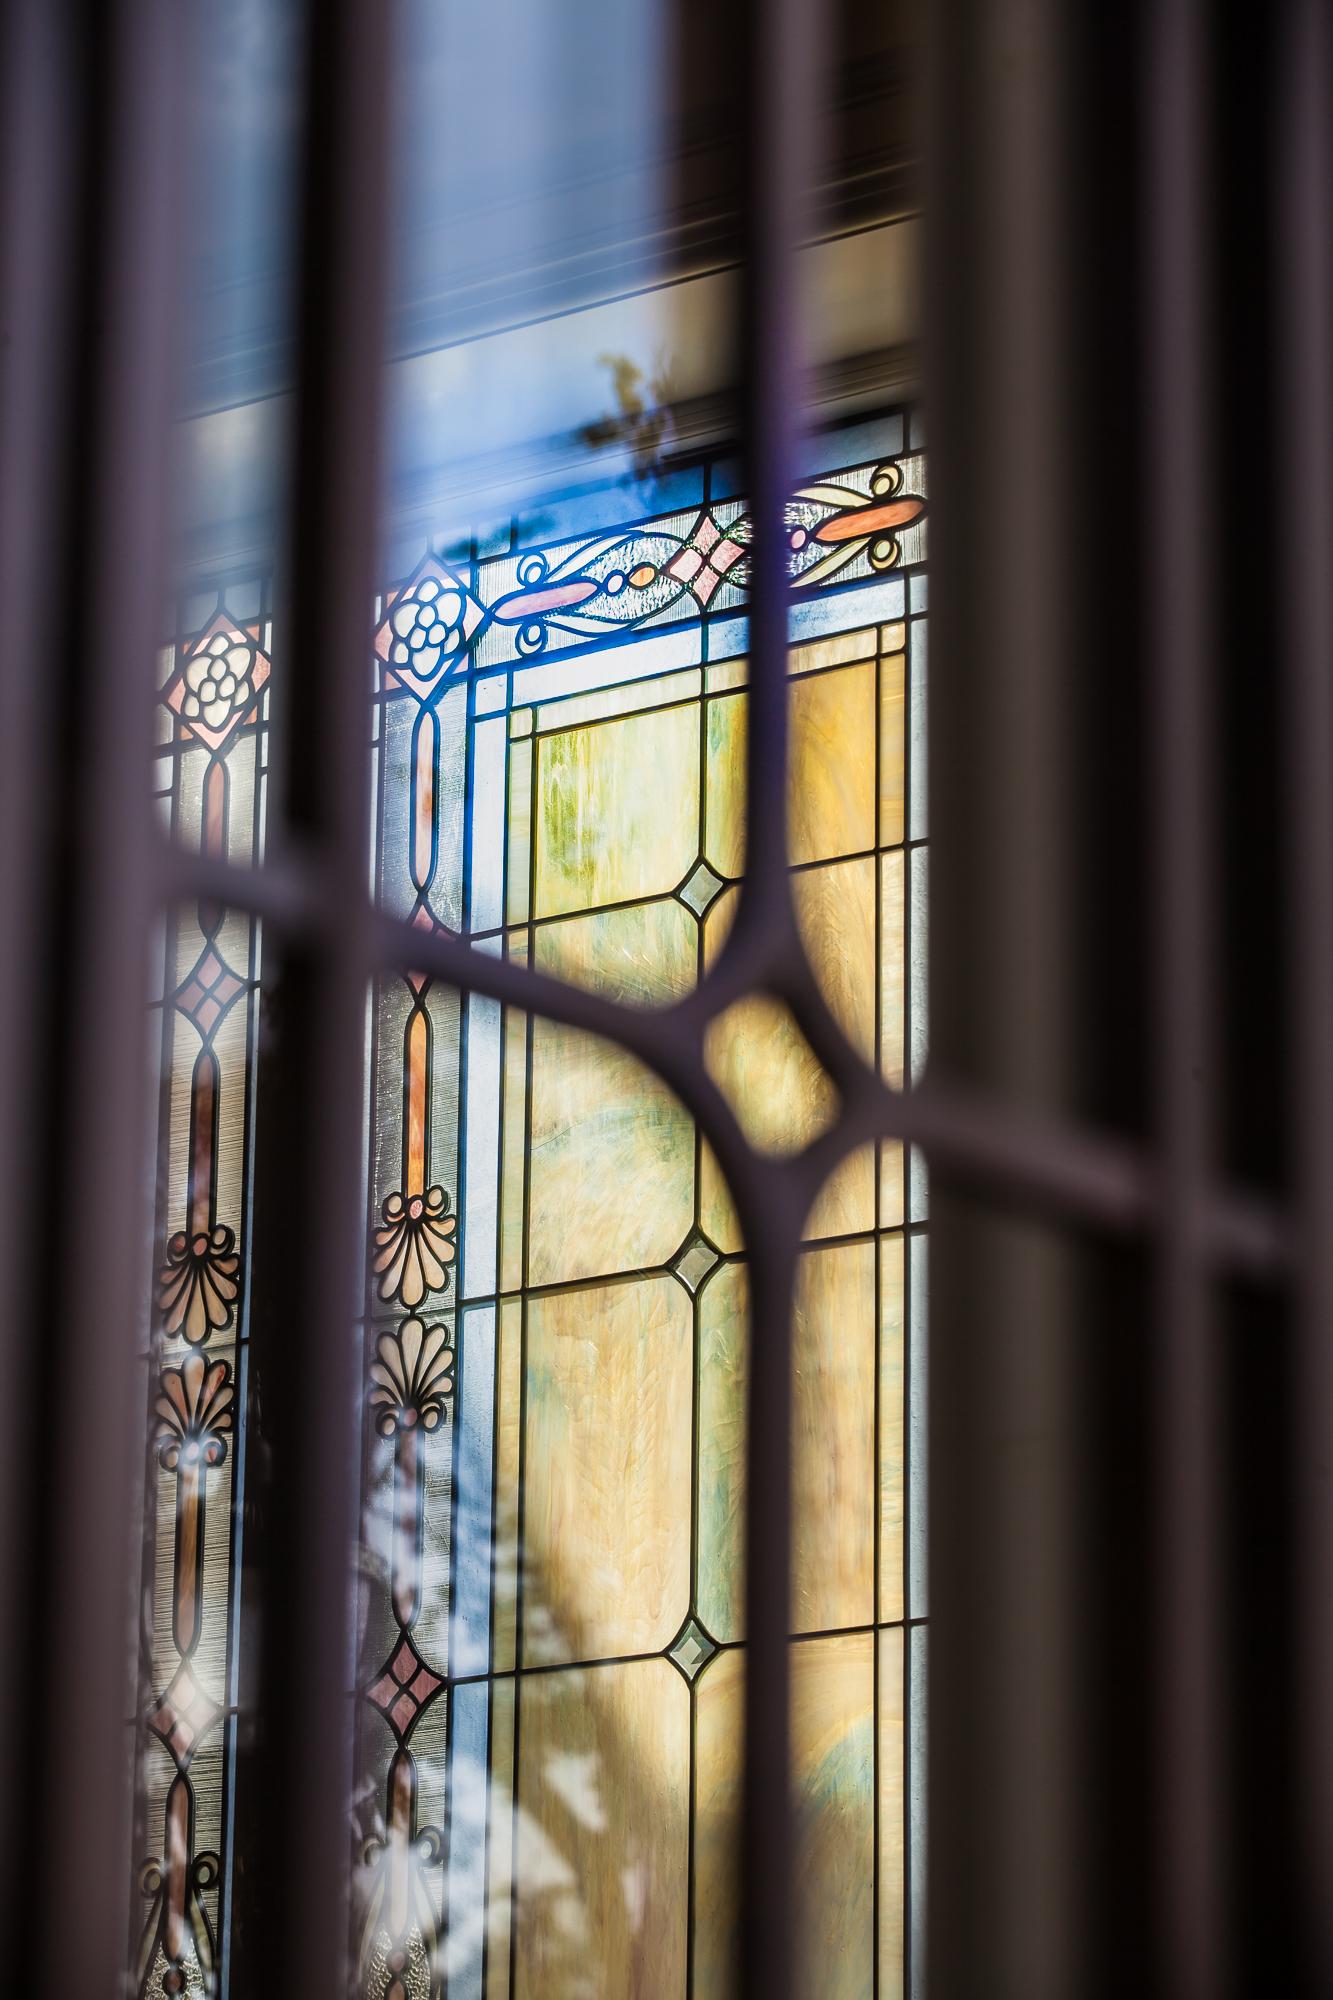 The glass art of the Baton Rouge Louisiana Temple with the sun shining through on Sunday, Nov. 17, 2019.